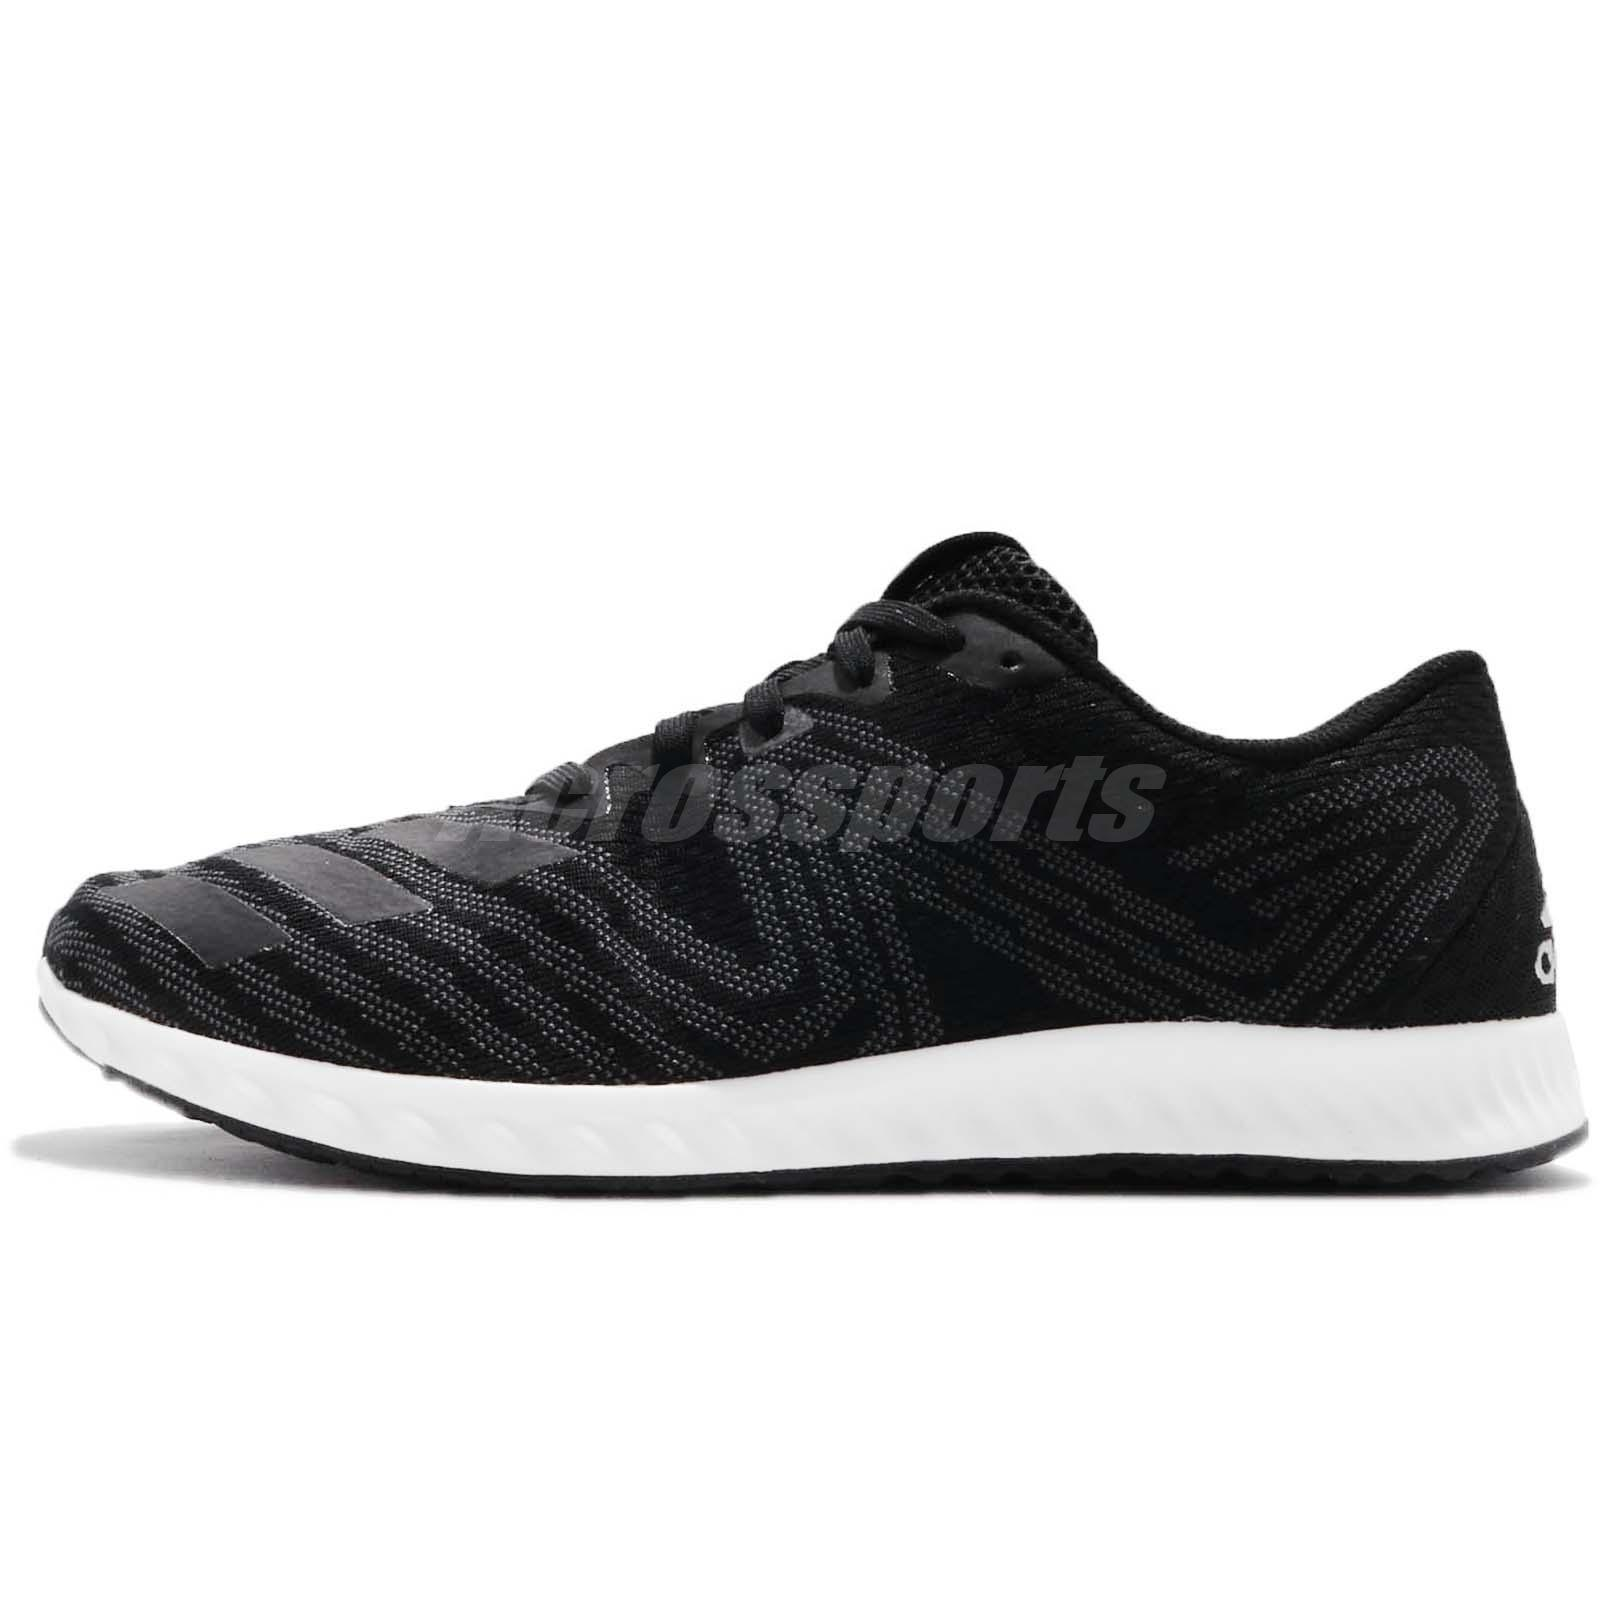 promo code 73122 a6df2 adidas Aerobounce PR M Black White Men Running Shoes Sneakers DA9917